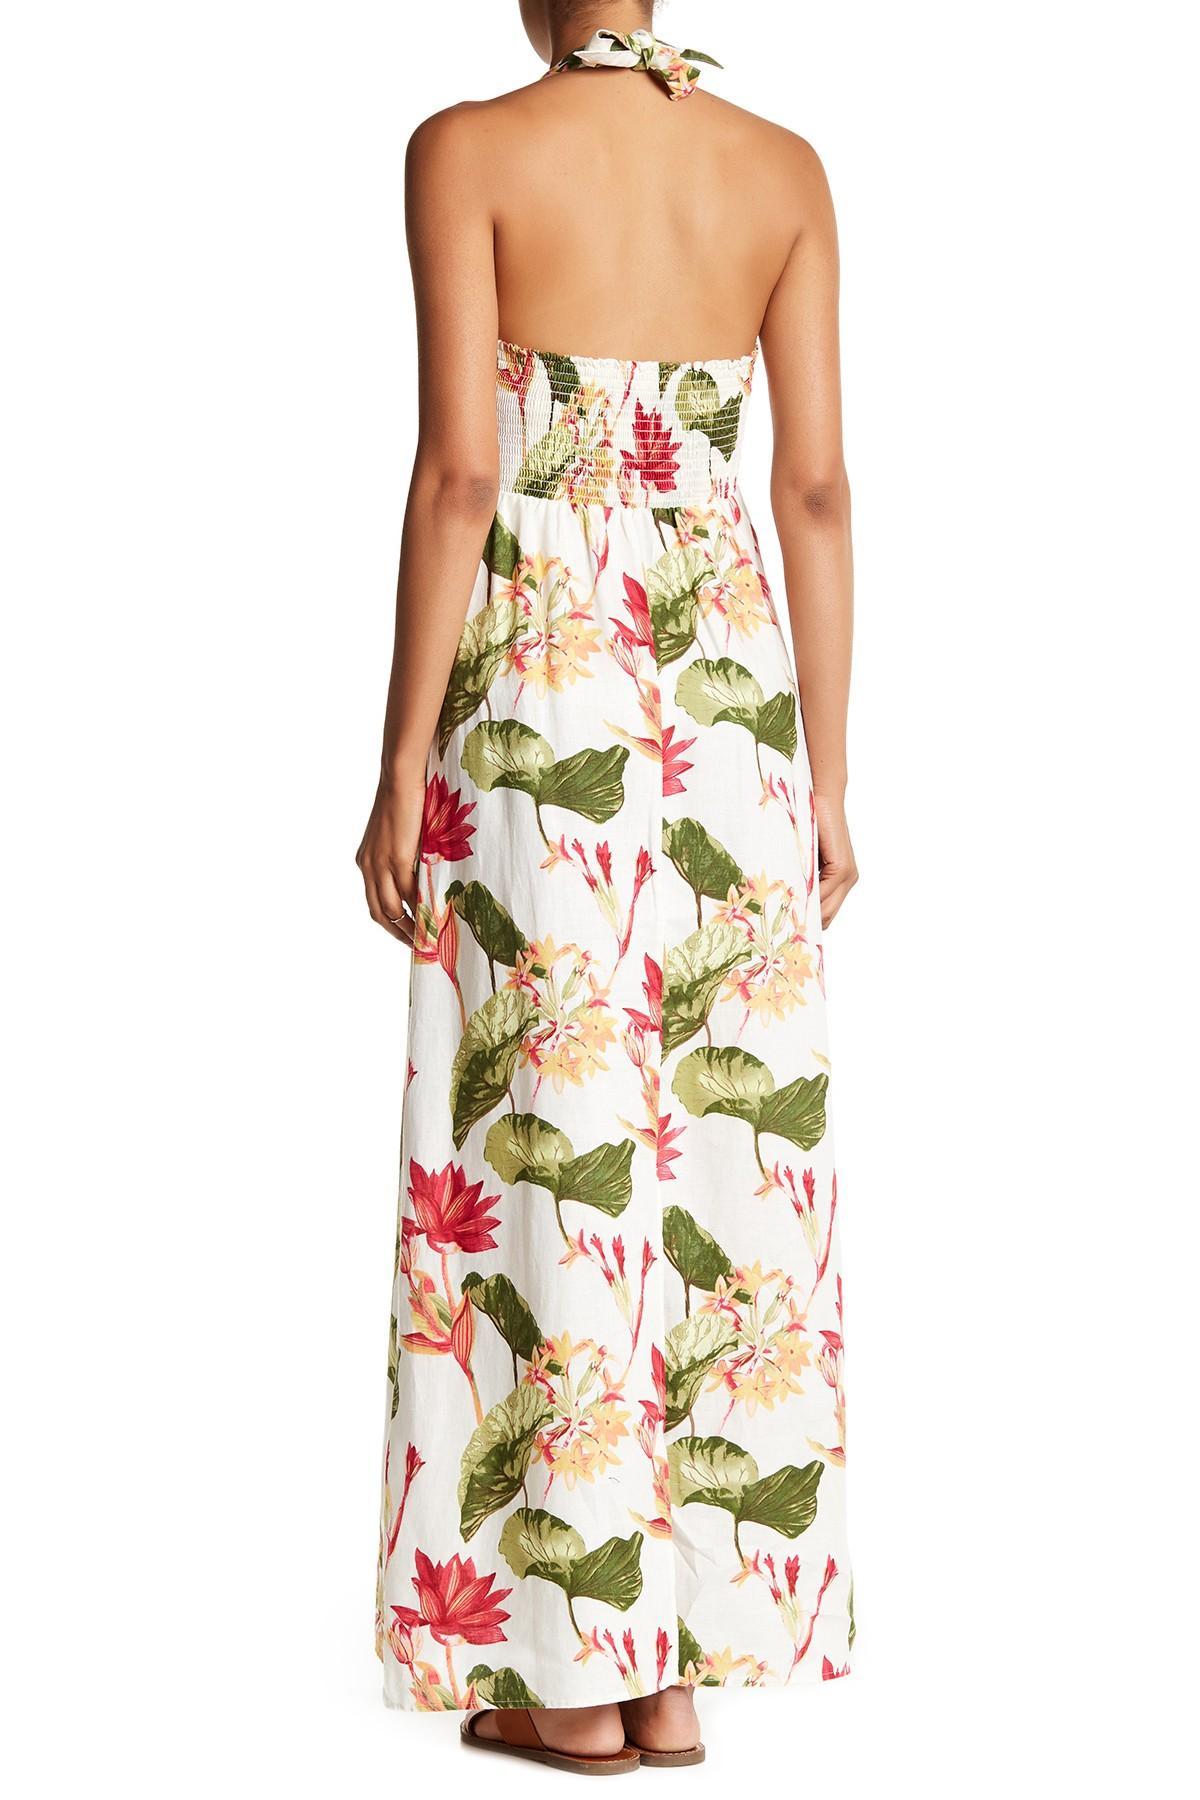 Lyst Tommy Bahama Tropical Lilies Halter Linen Dress